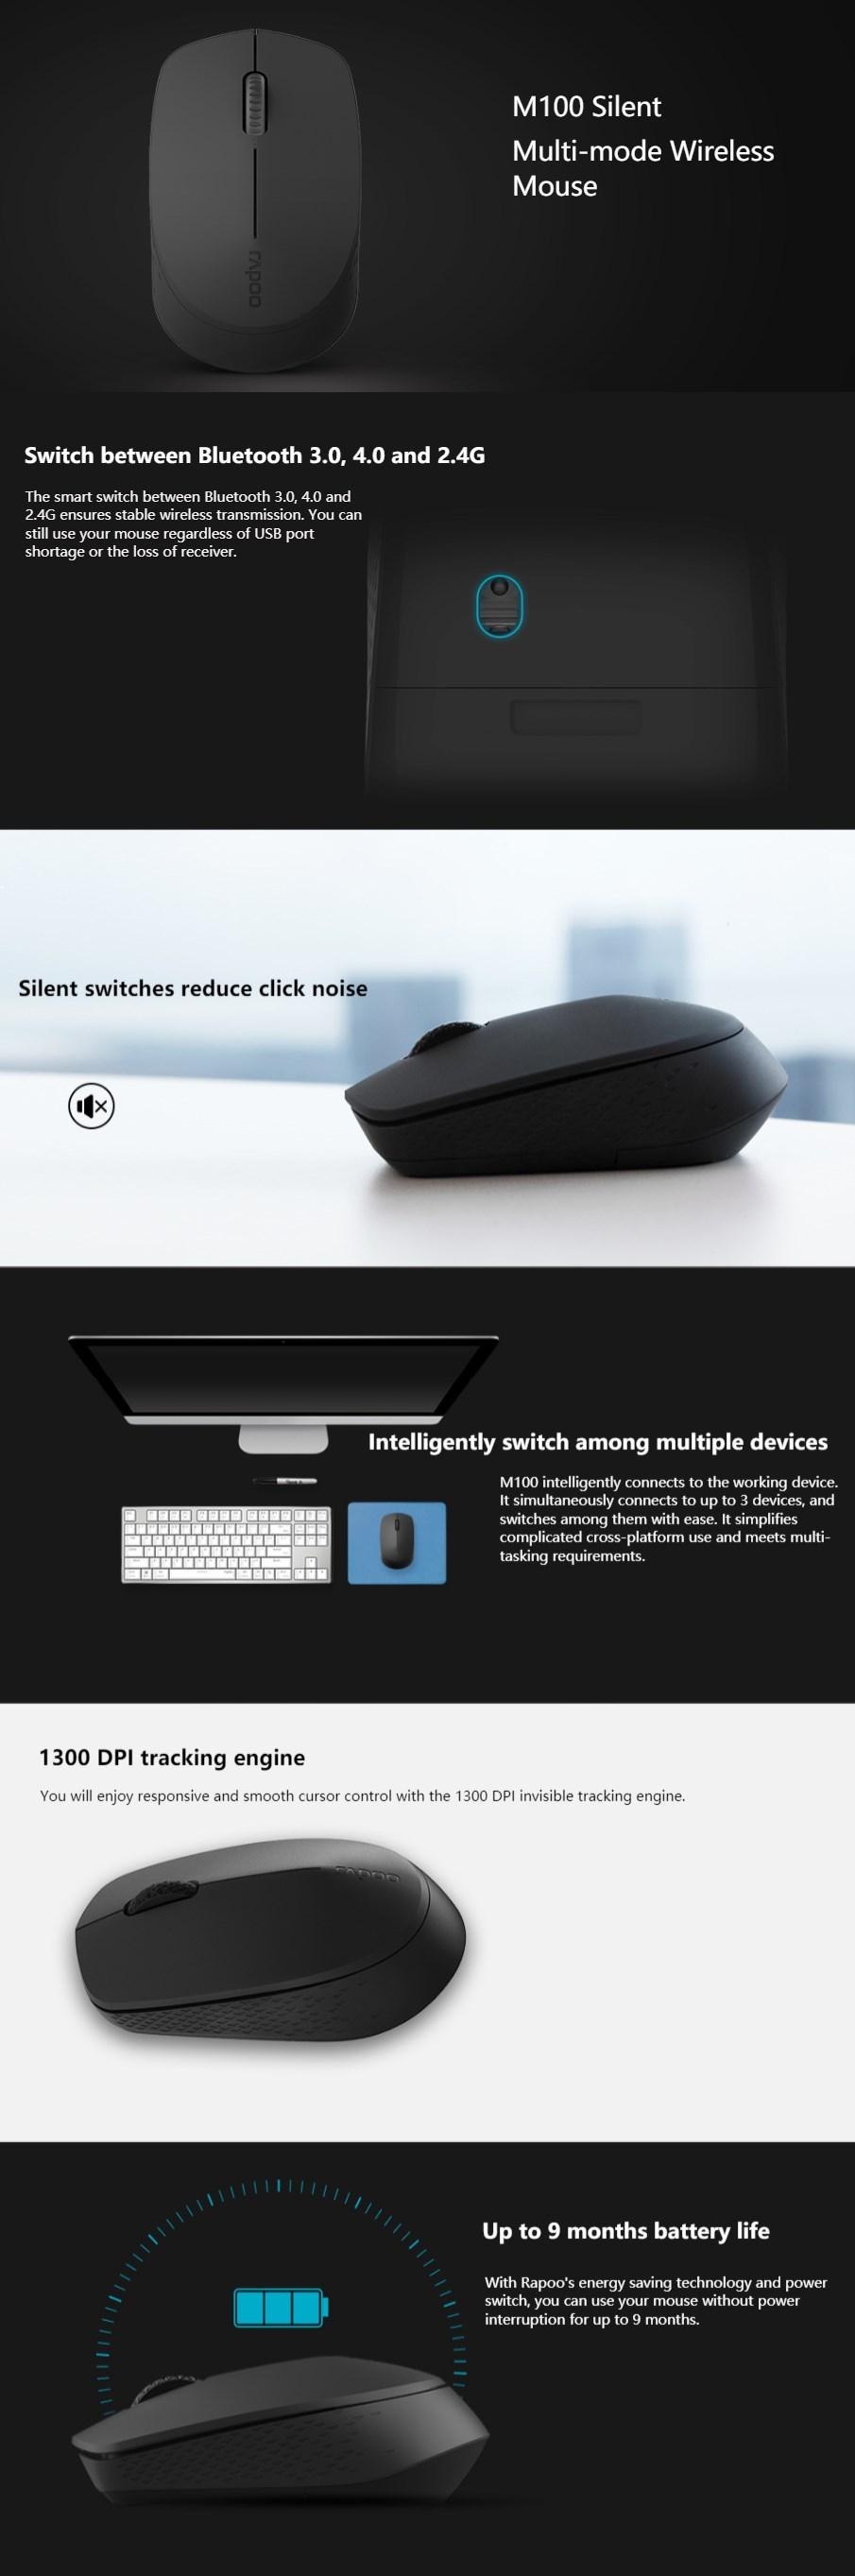 rapoo-m100-multimode-wireless-bluetooth-quiet-click-mouse-black-ac26645.jpg